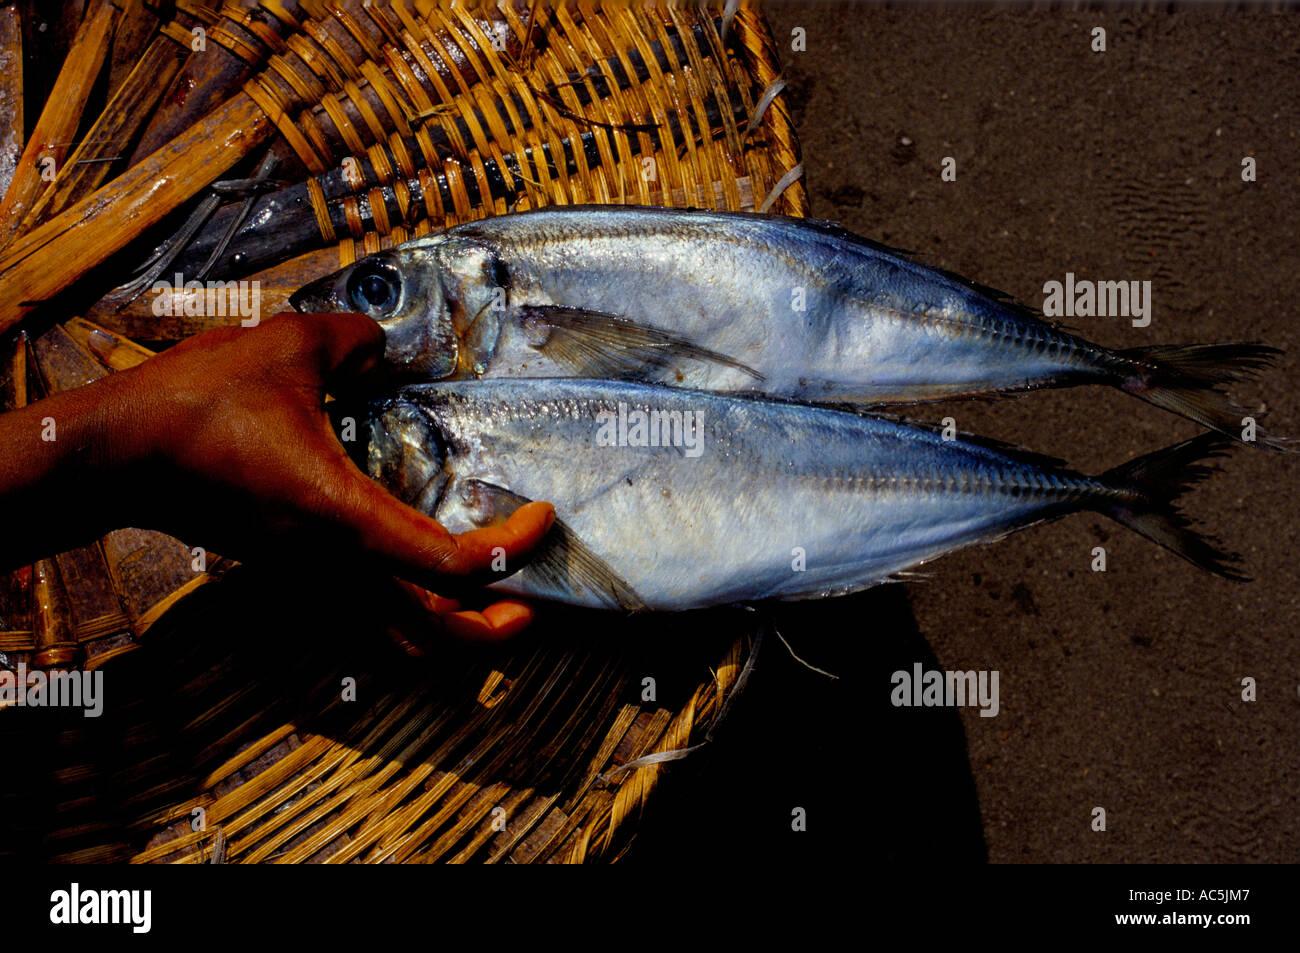 FRESH FISH ON SALE AT LAGOS MARKET NIGERIA 2001 - Stock Image